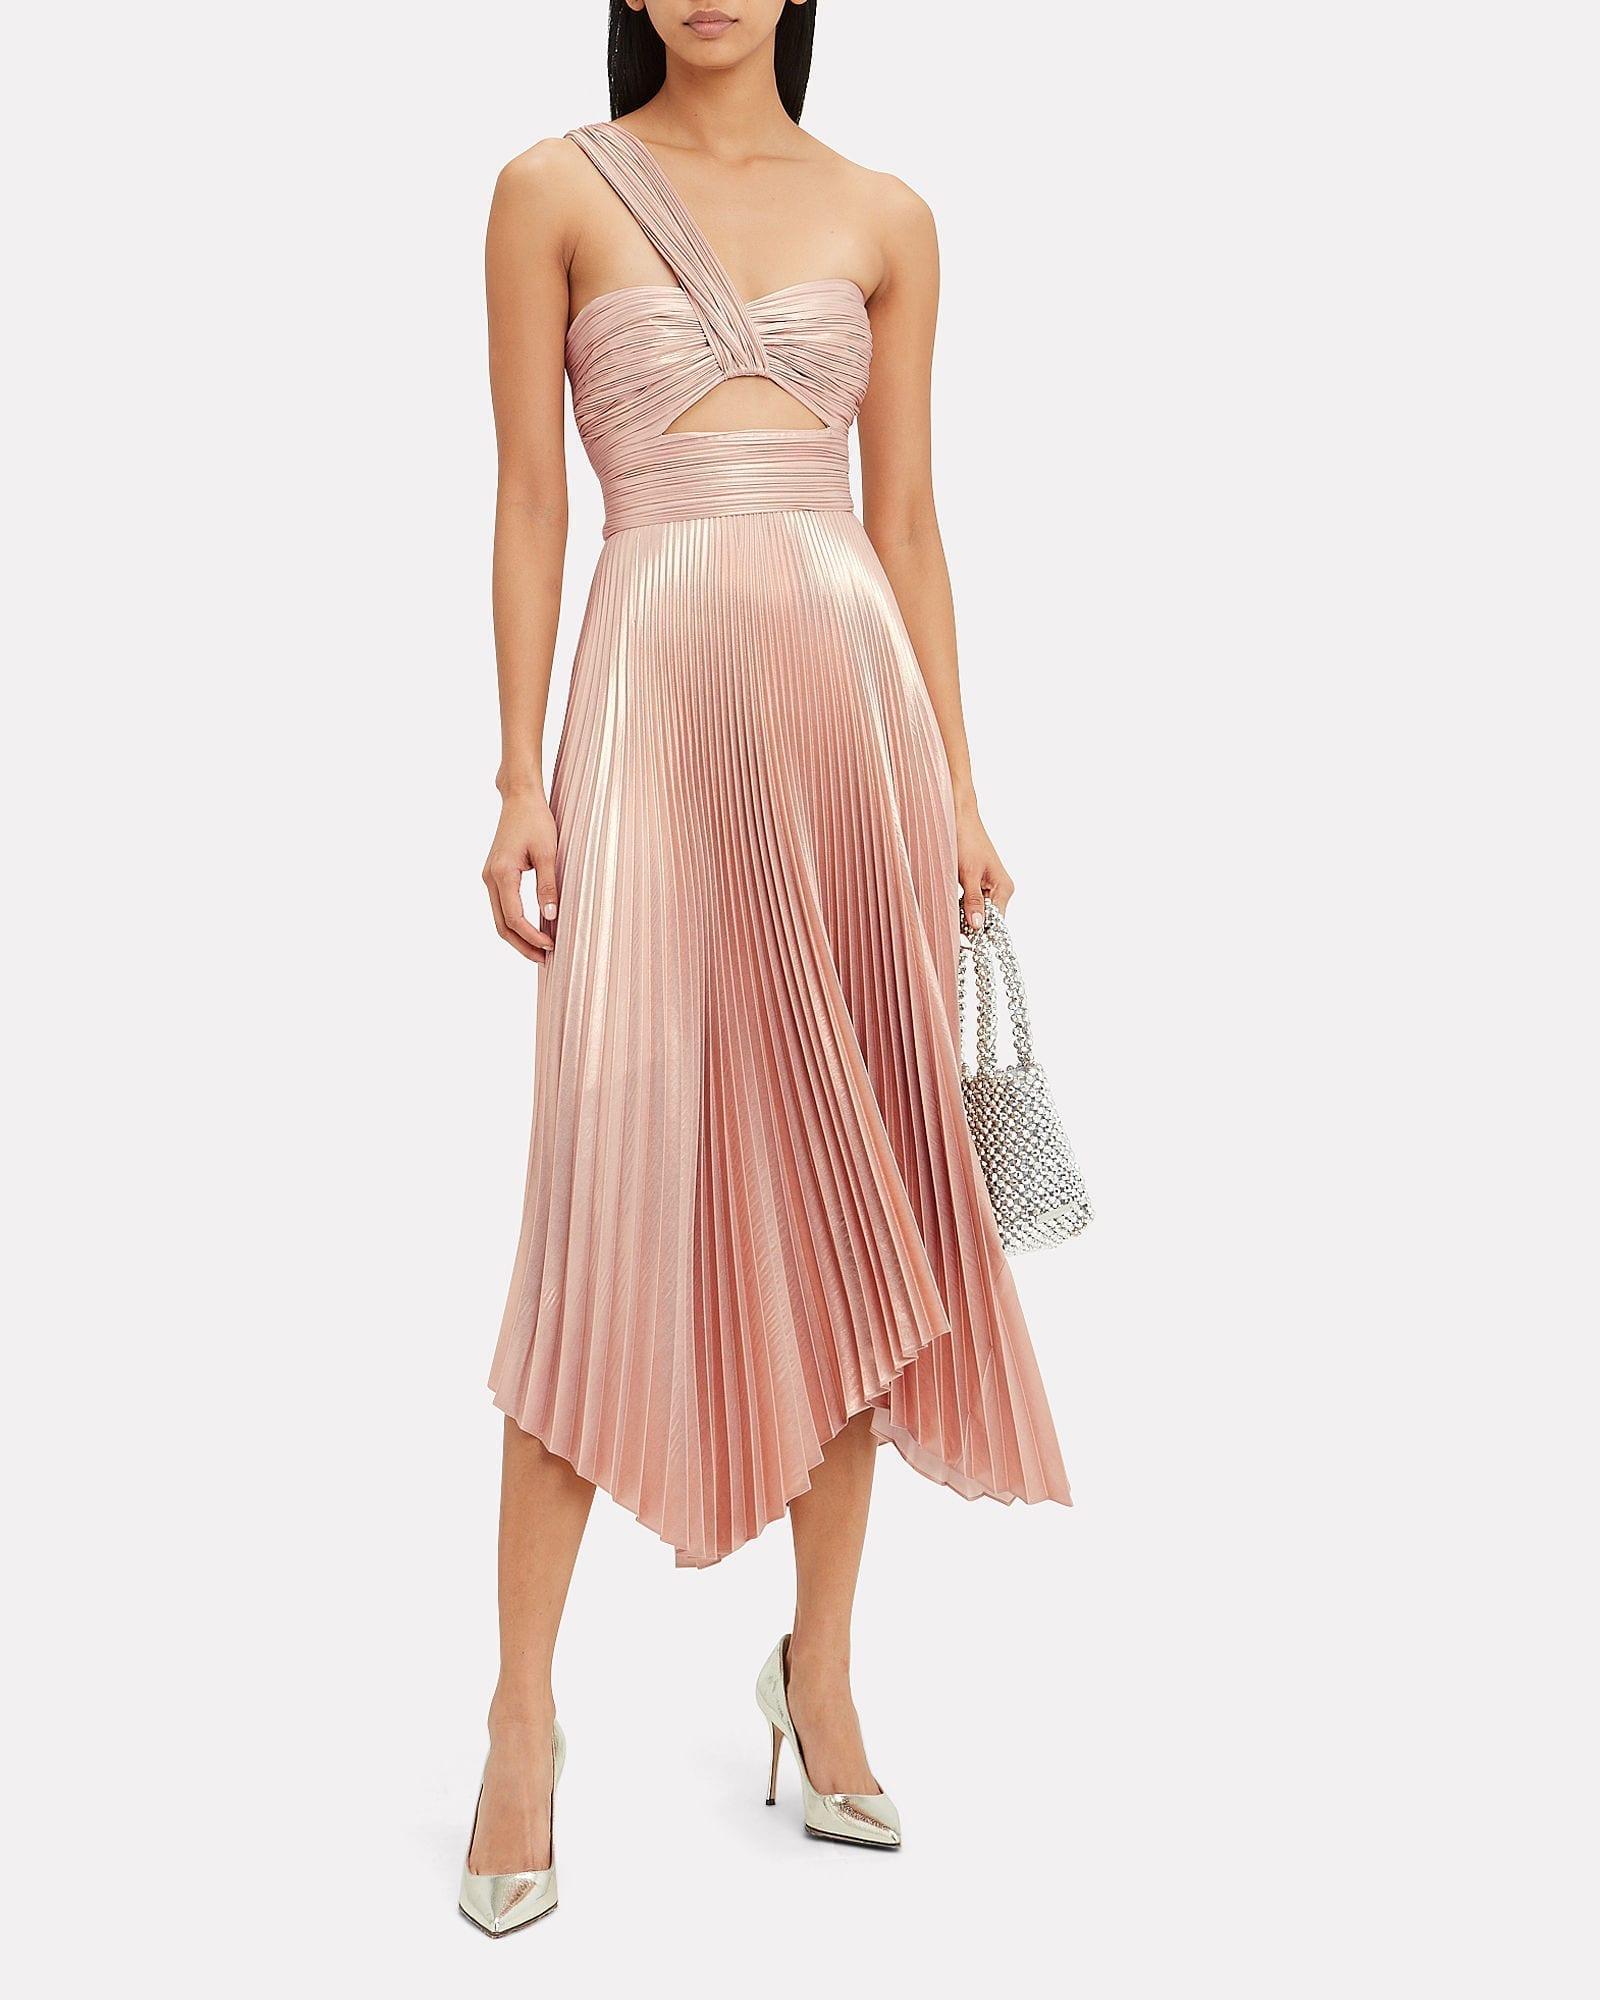 A.L.C. Aurora One Shoulder Metallic Dress